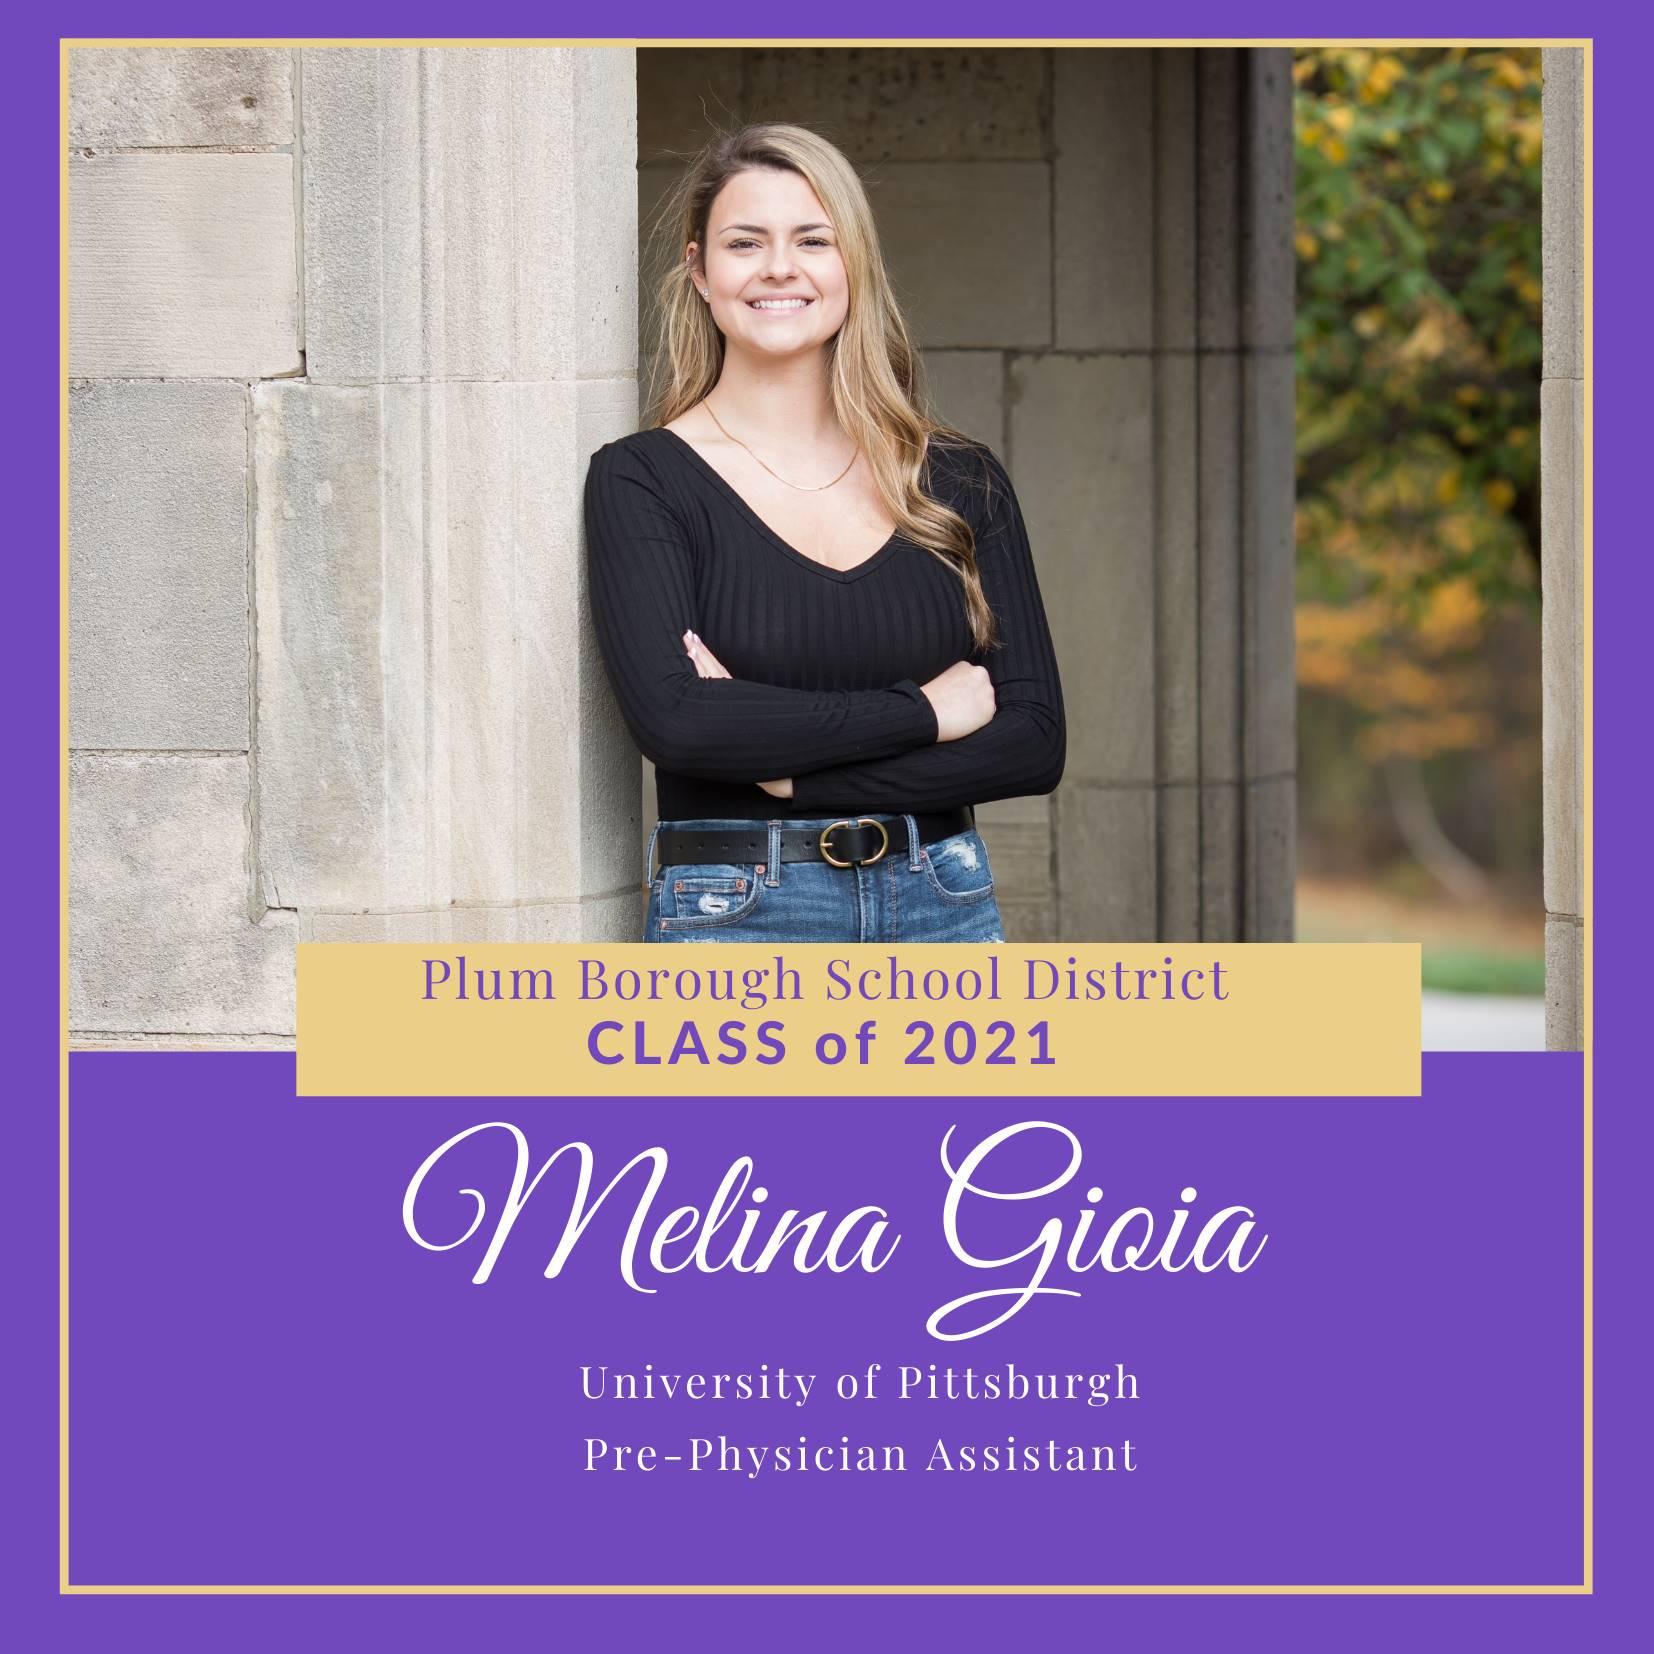 Congratulations to Melina Gioia, Class of 2021!